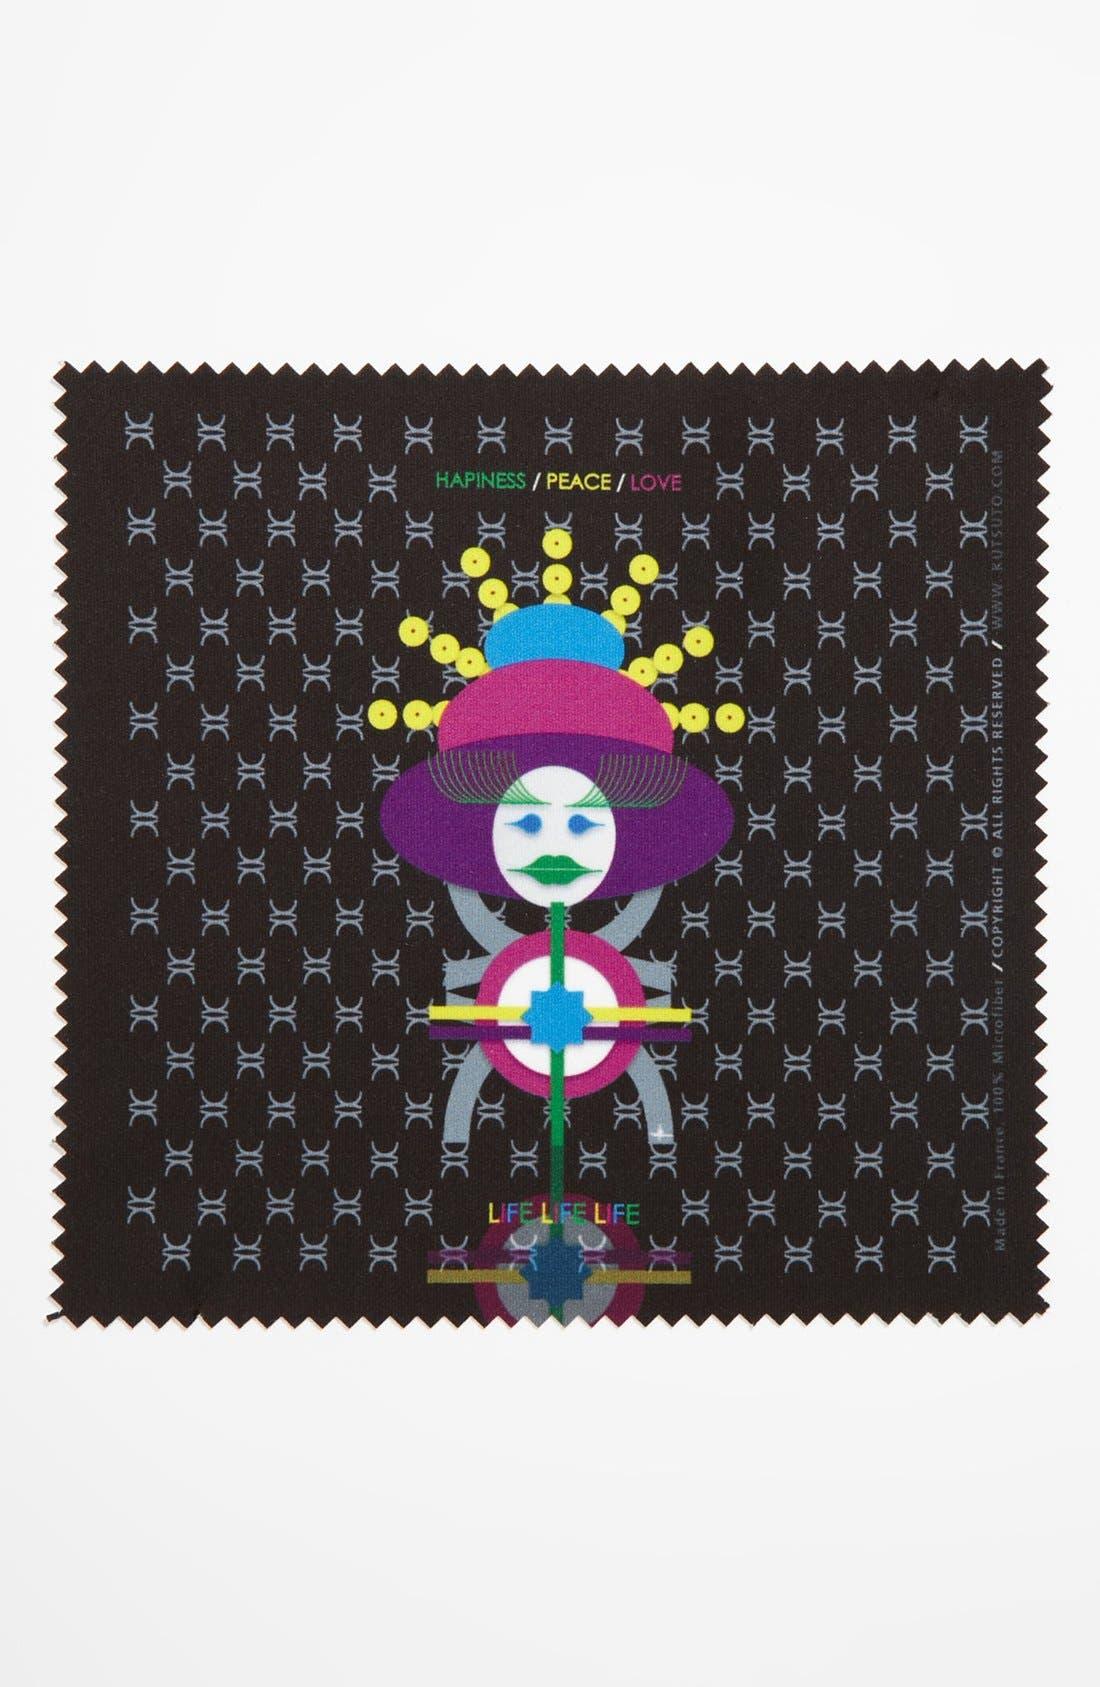 Main Image - KUTSUTO 'Kutsinette - Life Life Life' Microfiber Cloth